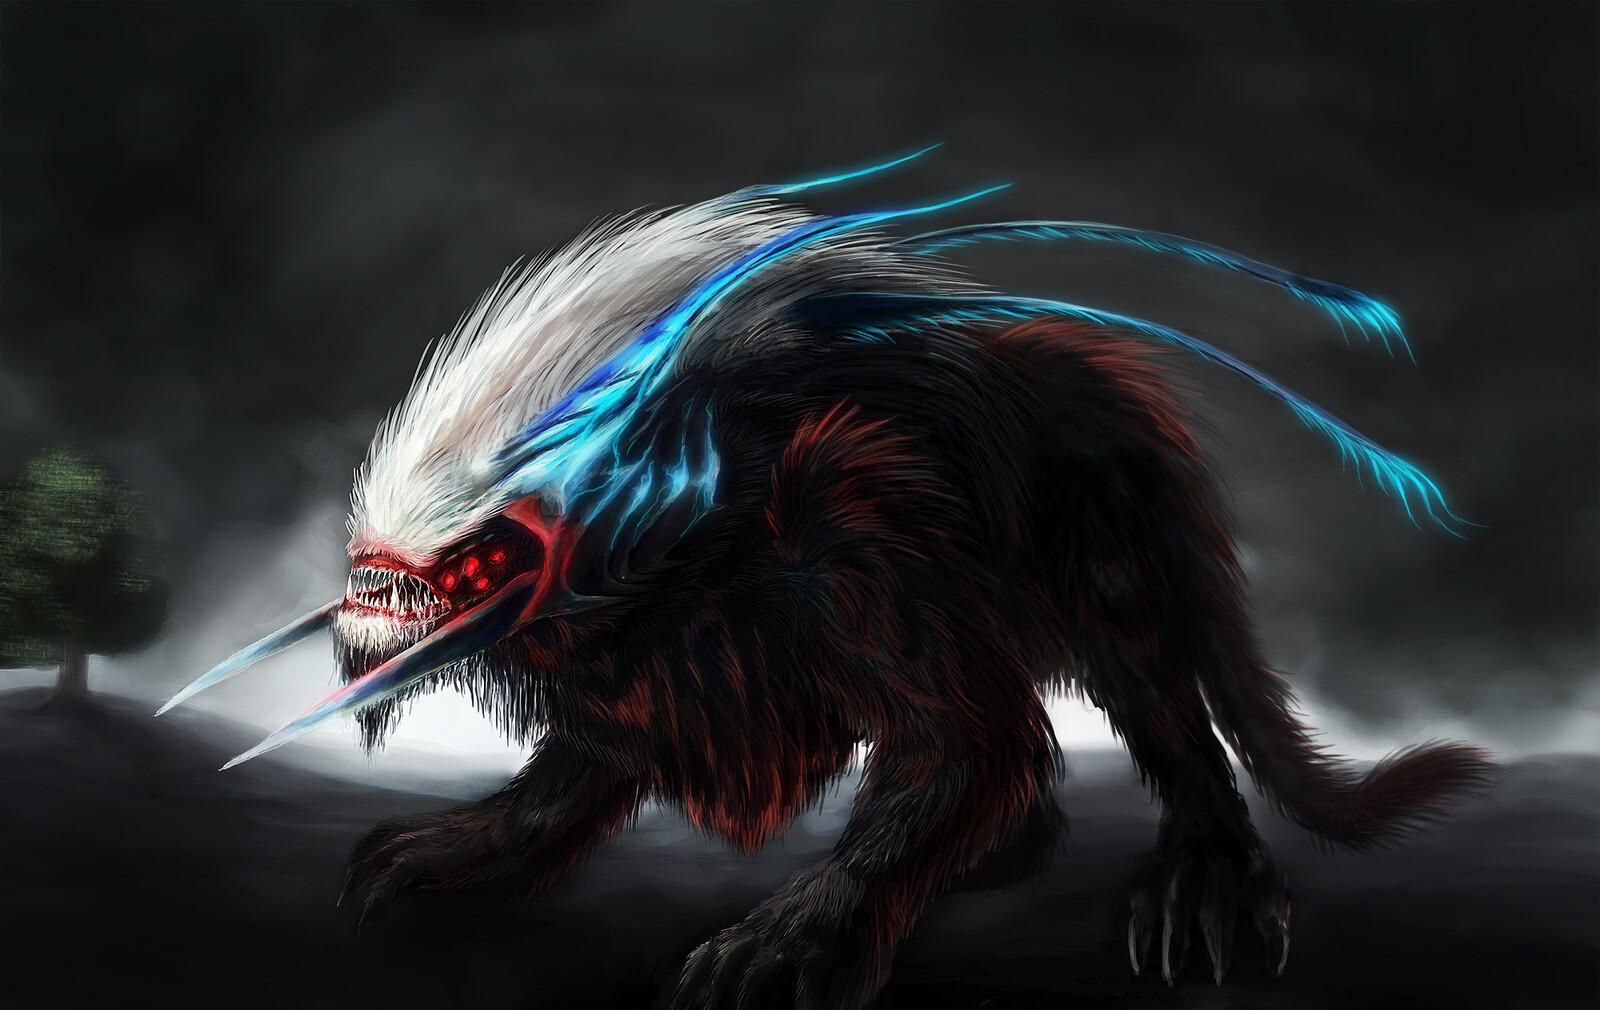 Inferorum Canis Colossus